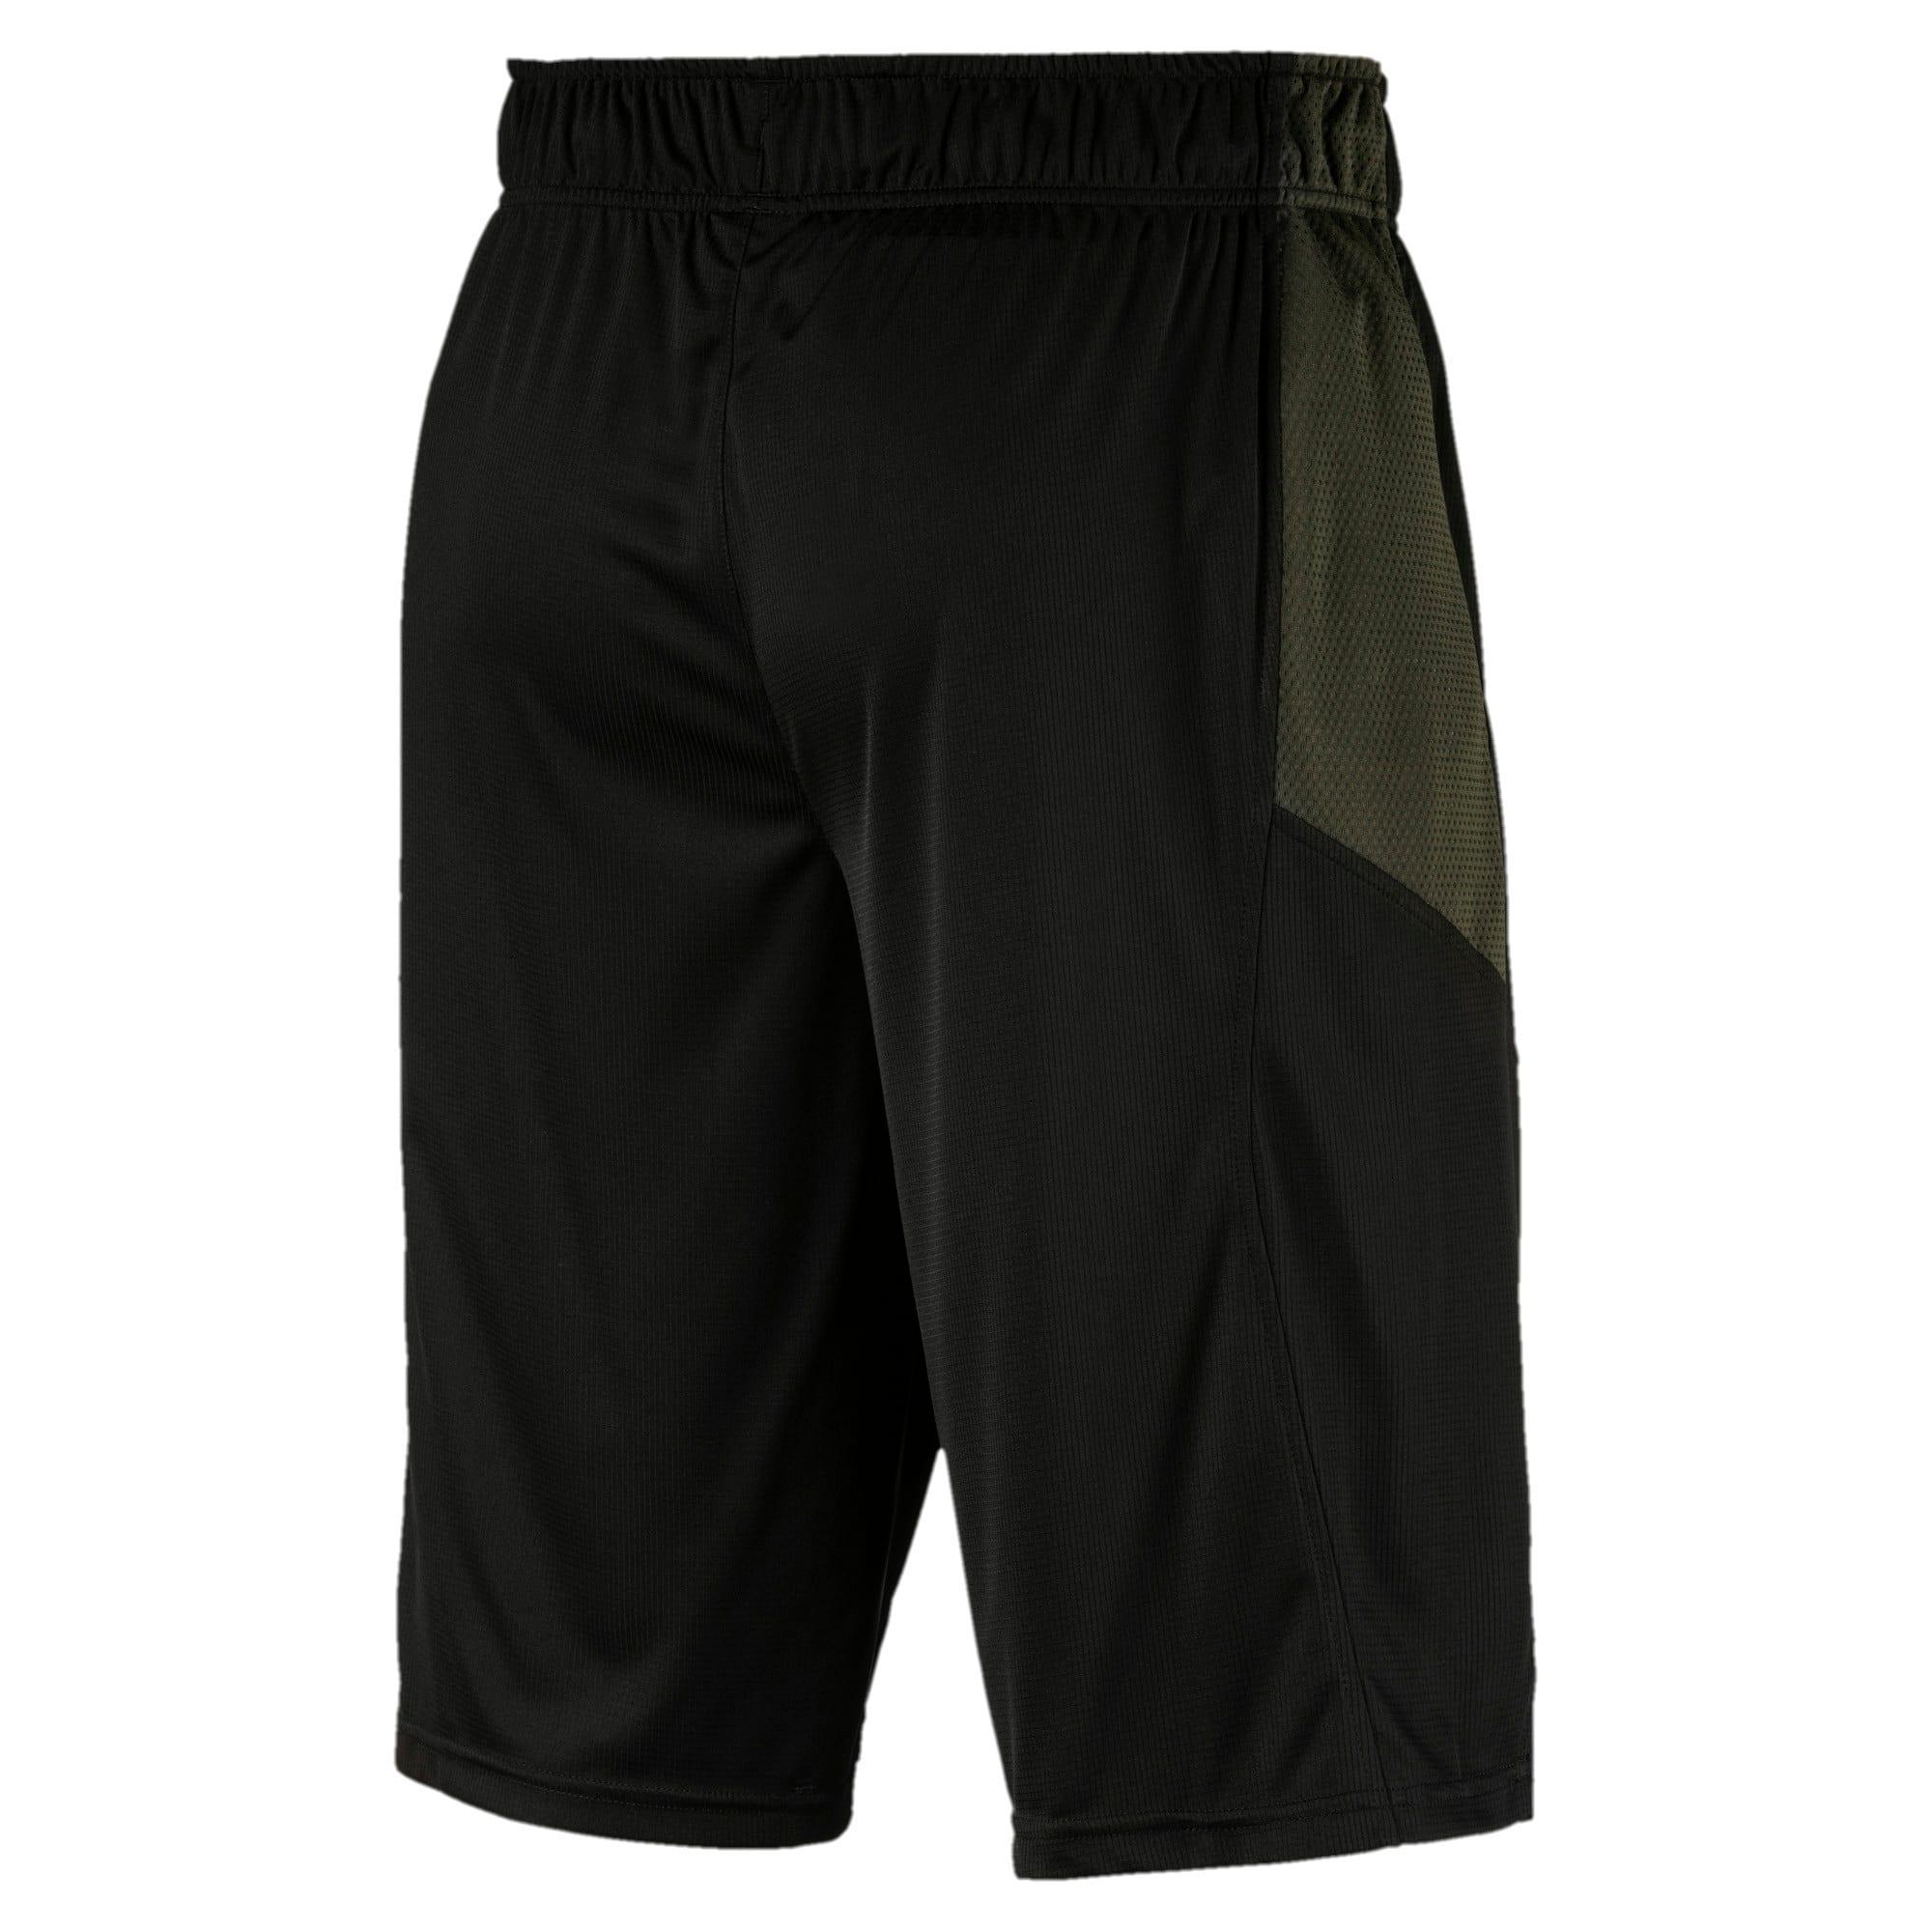 "Thumbnail 5 of Energy 11"" Men's Running Shorts, Puma Black-Forest Night, medium-IND"